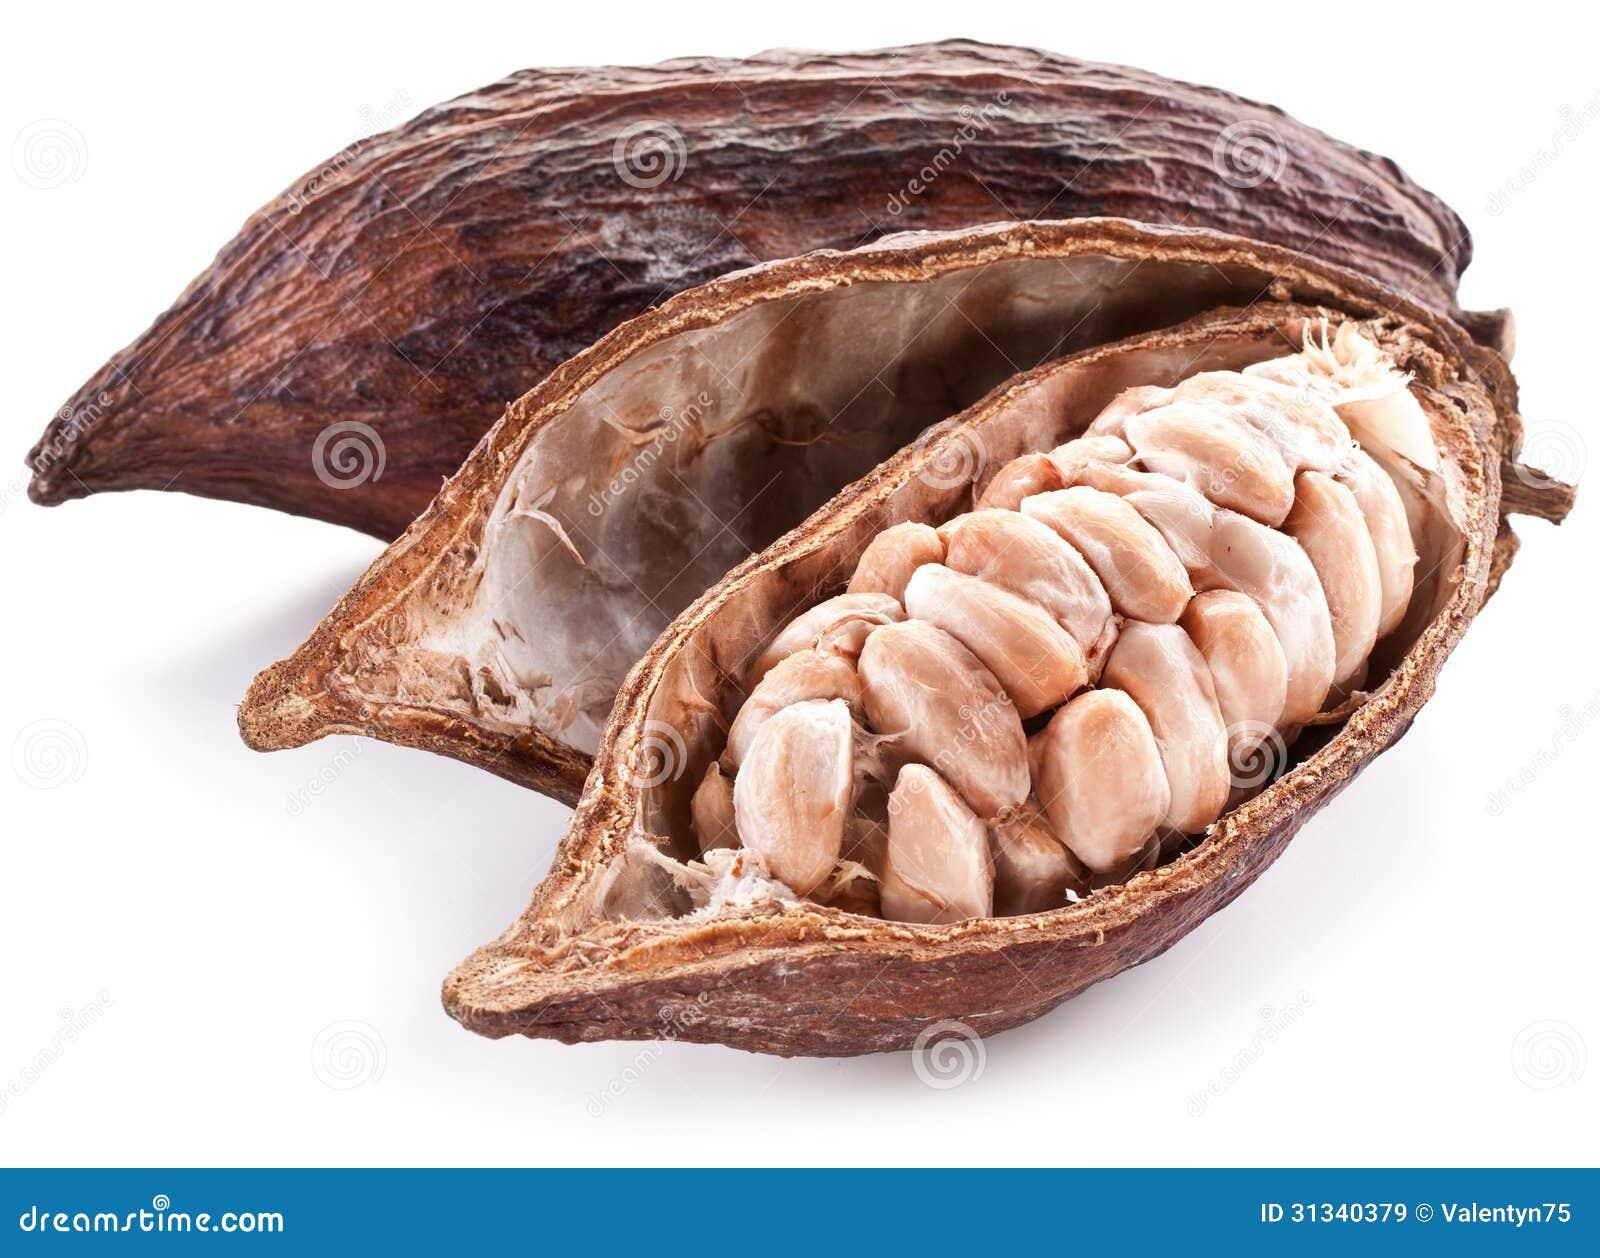 Cocoa Pod Stock Image Image Of Plant Slice Dried Fruit